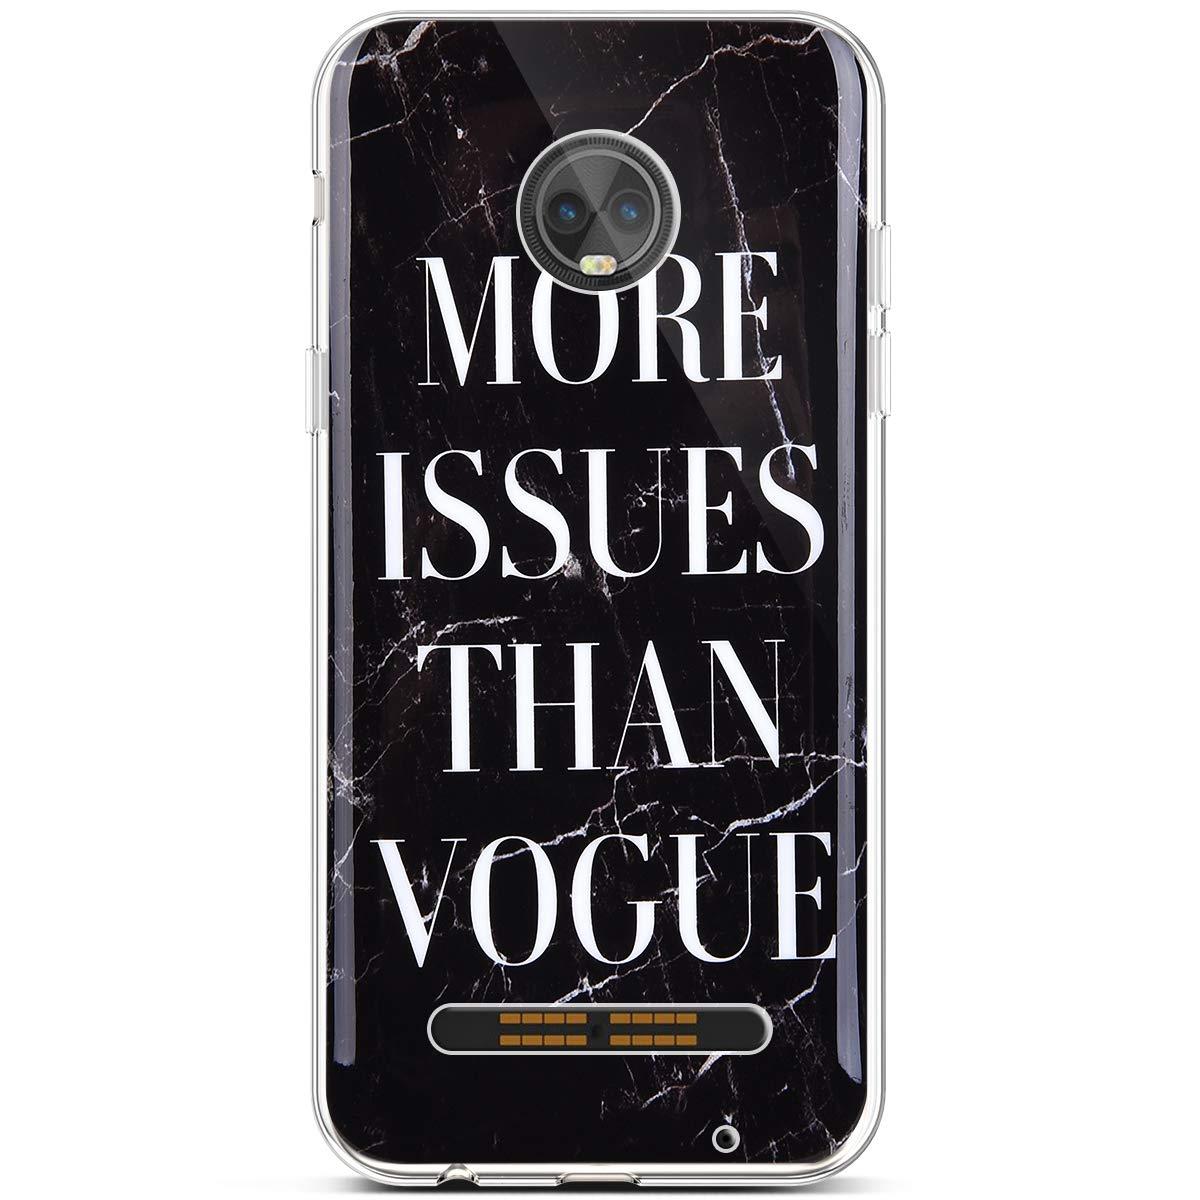 2 PHEZEN Moto Z3 Case,Moto Z3 Play Case,Fashion Marble Design Girl Women Soft Flexible Slim Thin TPU Rubber Skin Shockproof Transparent TPU Bumper Cover Protective Silicone Case for Moto Z3 Play